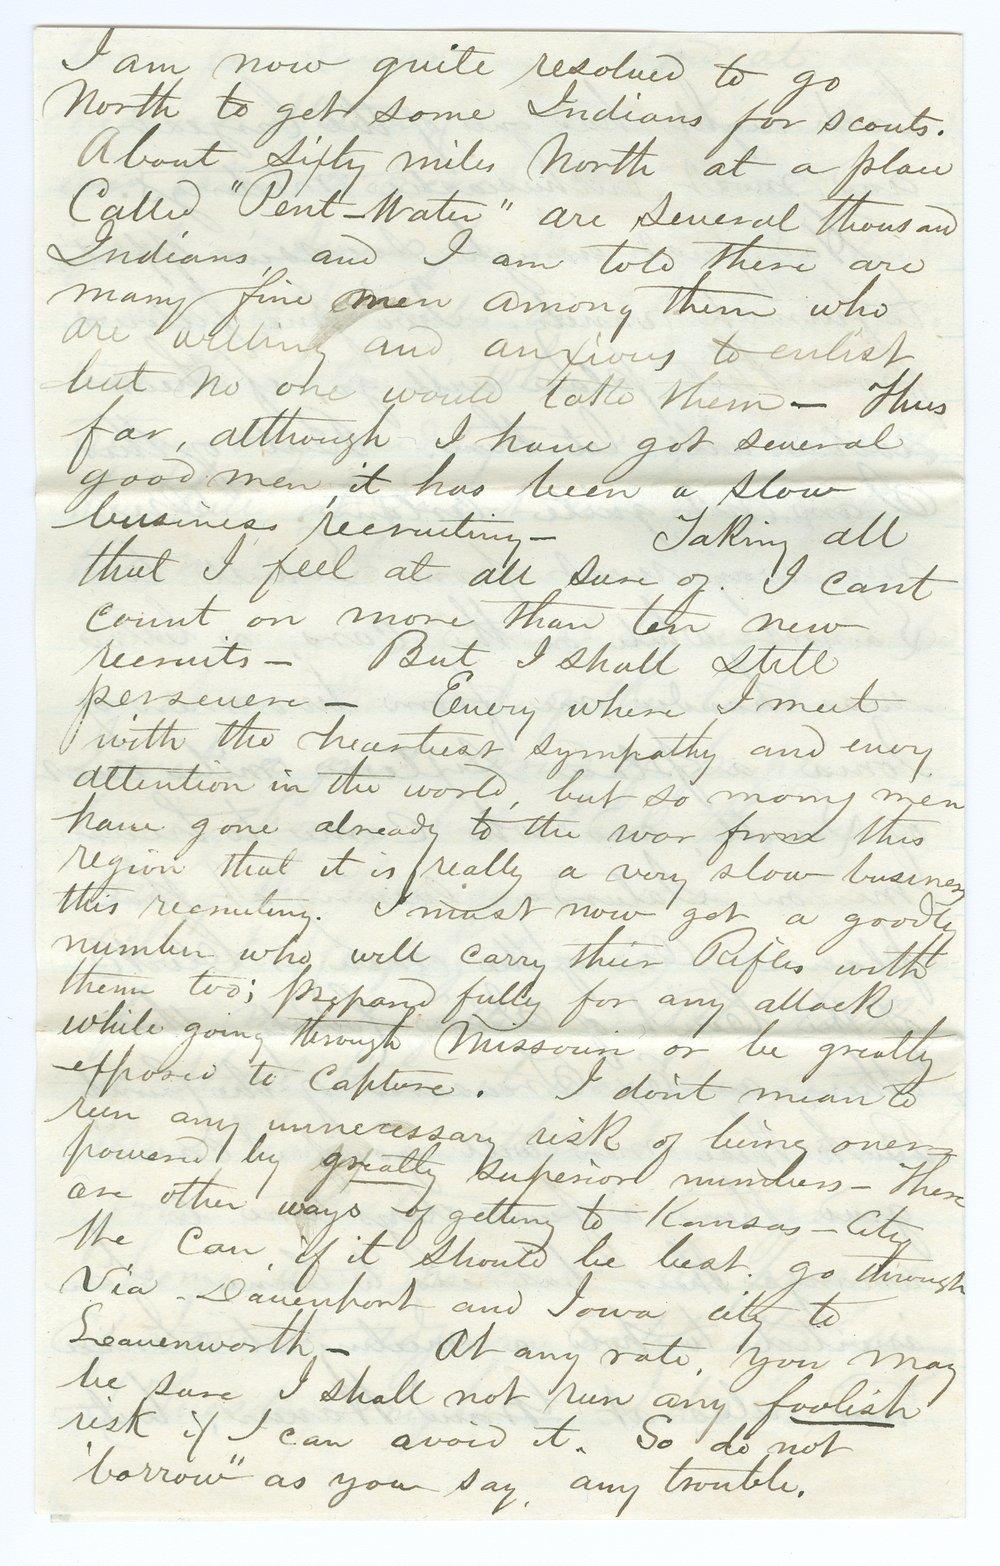 John Brown, Jr. correspondence - 12